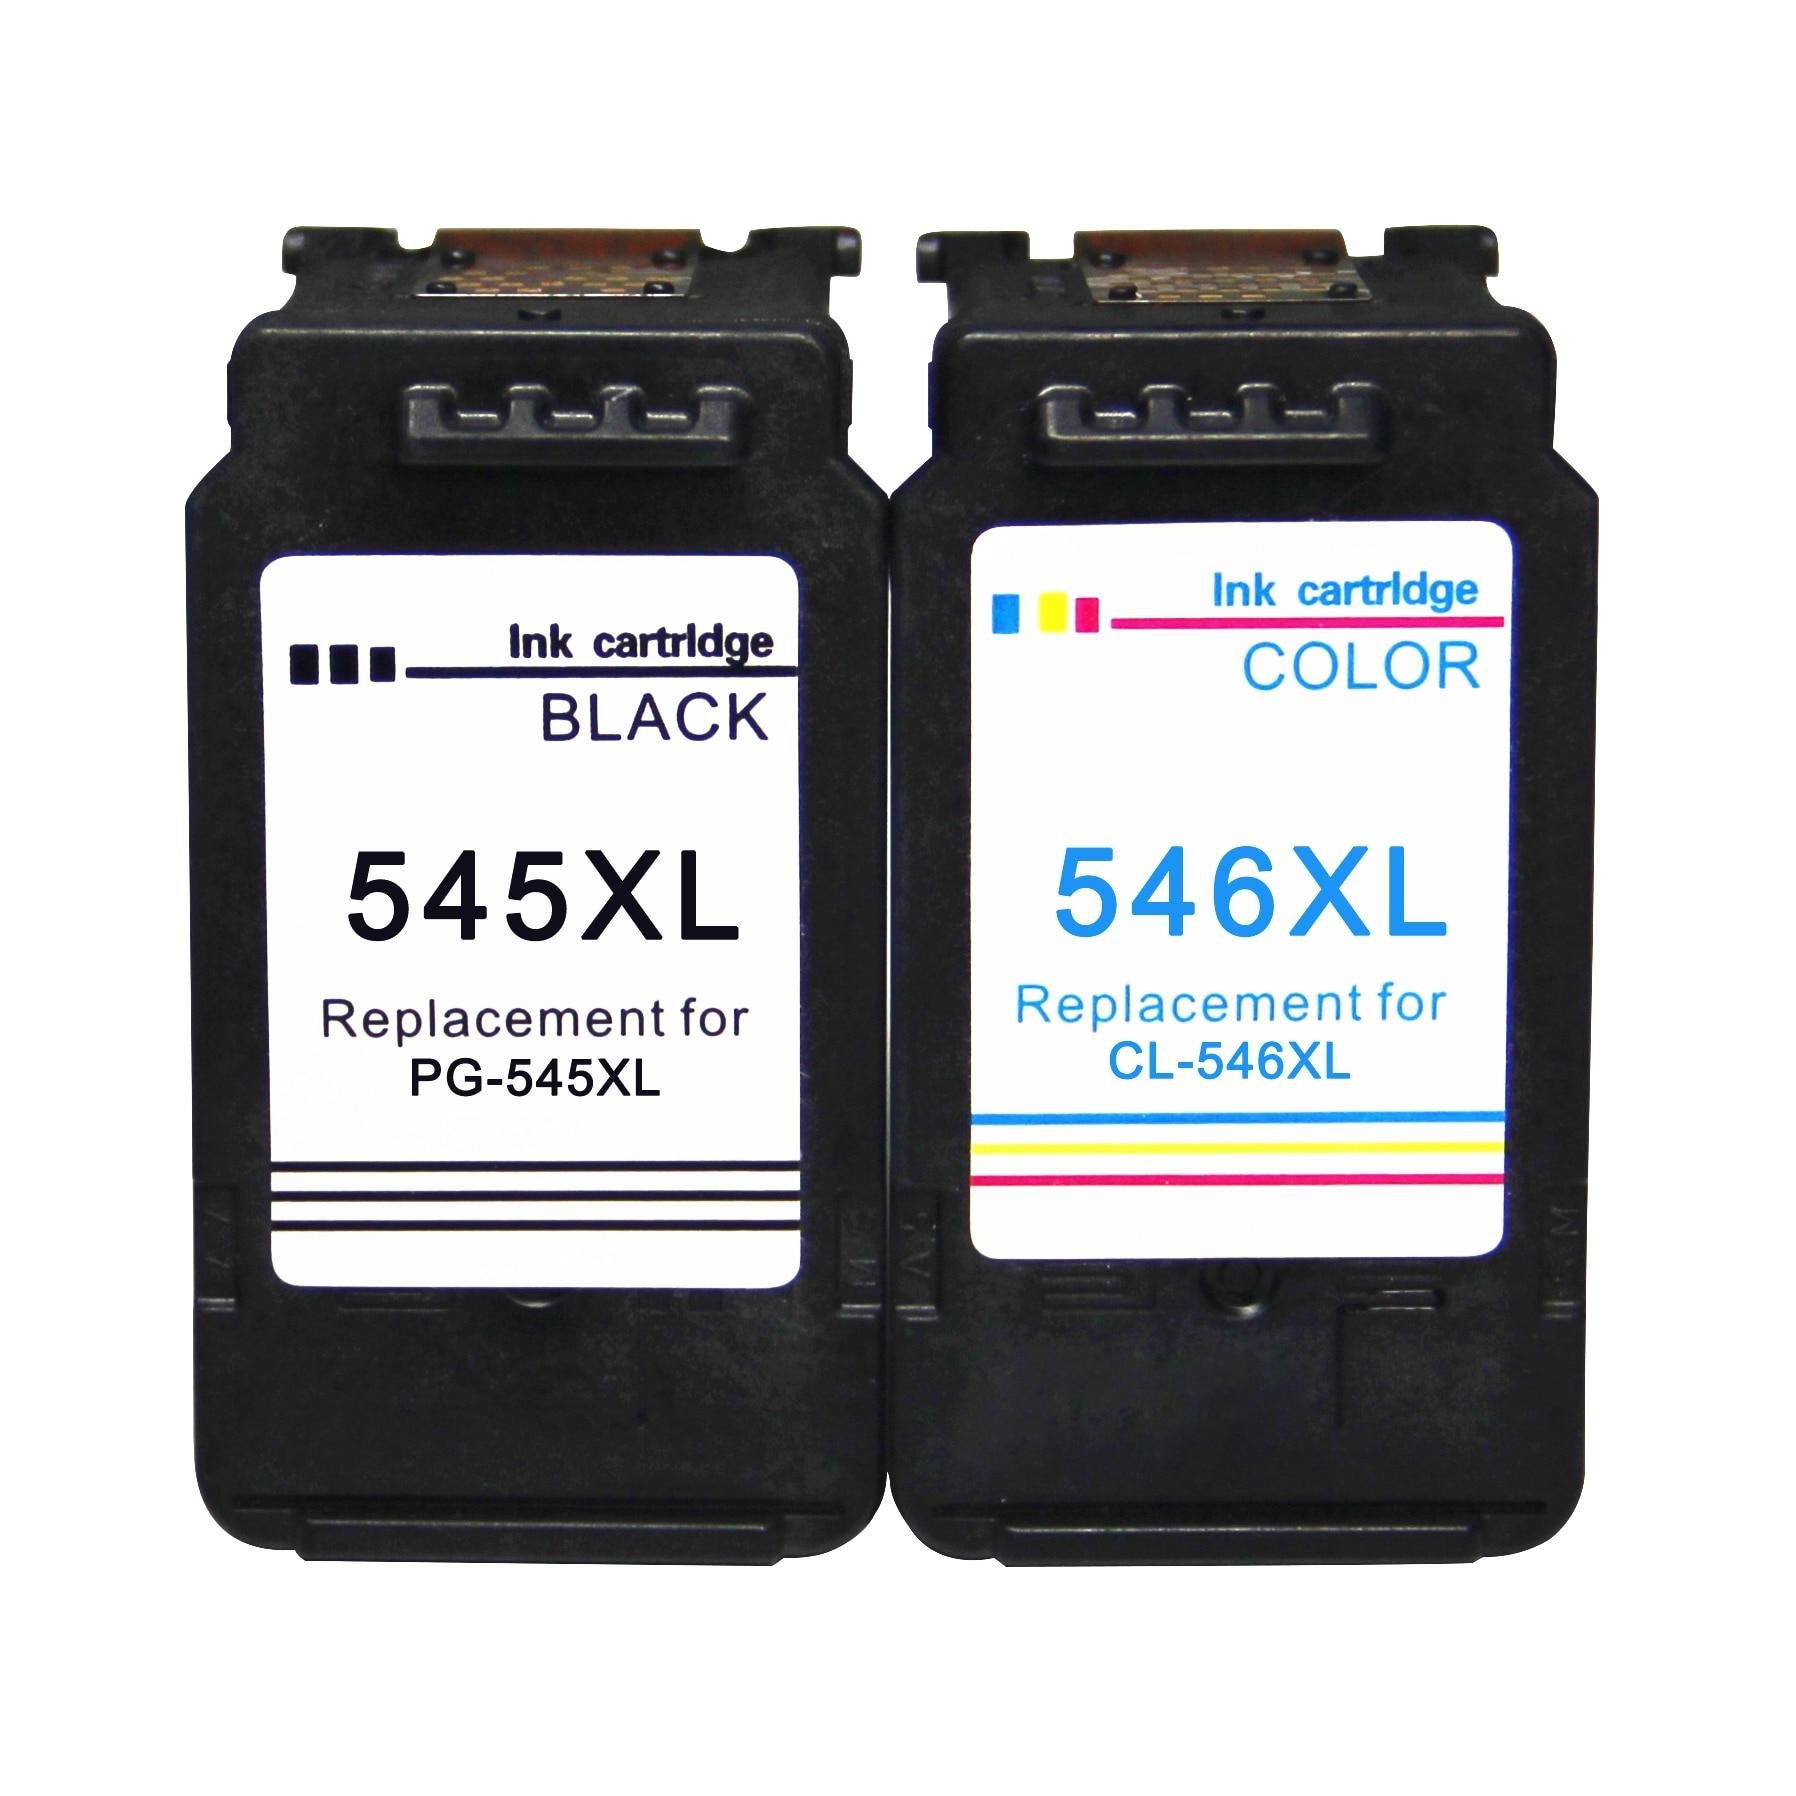 PG545 CL546 XL דיו מחסניות החלפה עבור Canon PG-545 pg 545 CL-546 עבור Canon IP2850 MX495 MG2950 MG2550 MG2500 MG3050